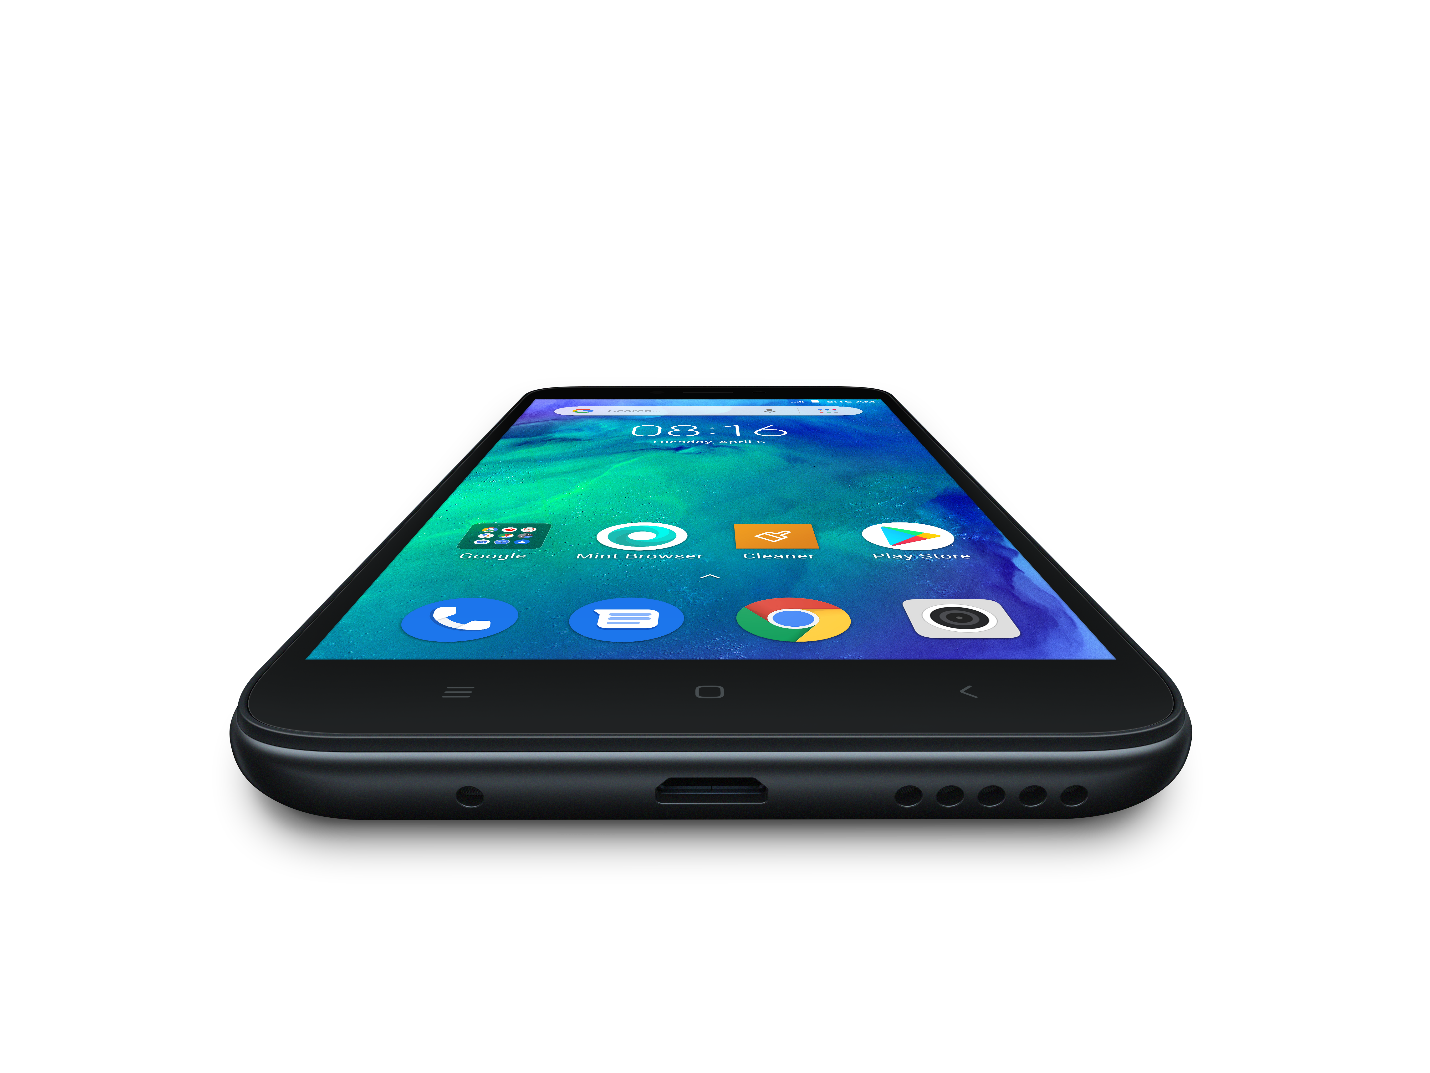 Xiaomi releases Redmi Go smartphone at PKR. 13,999